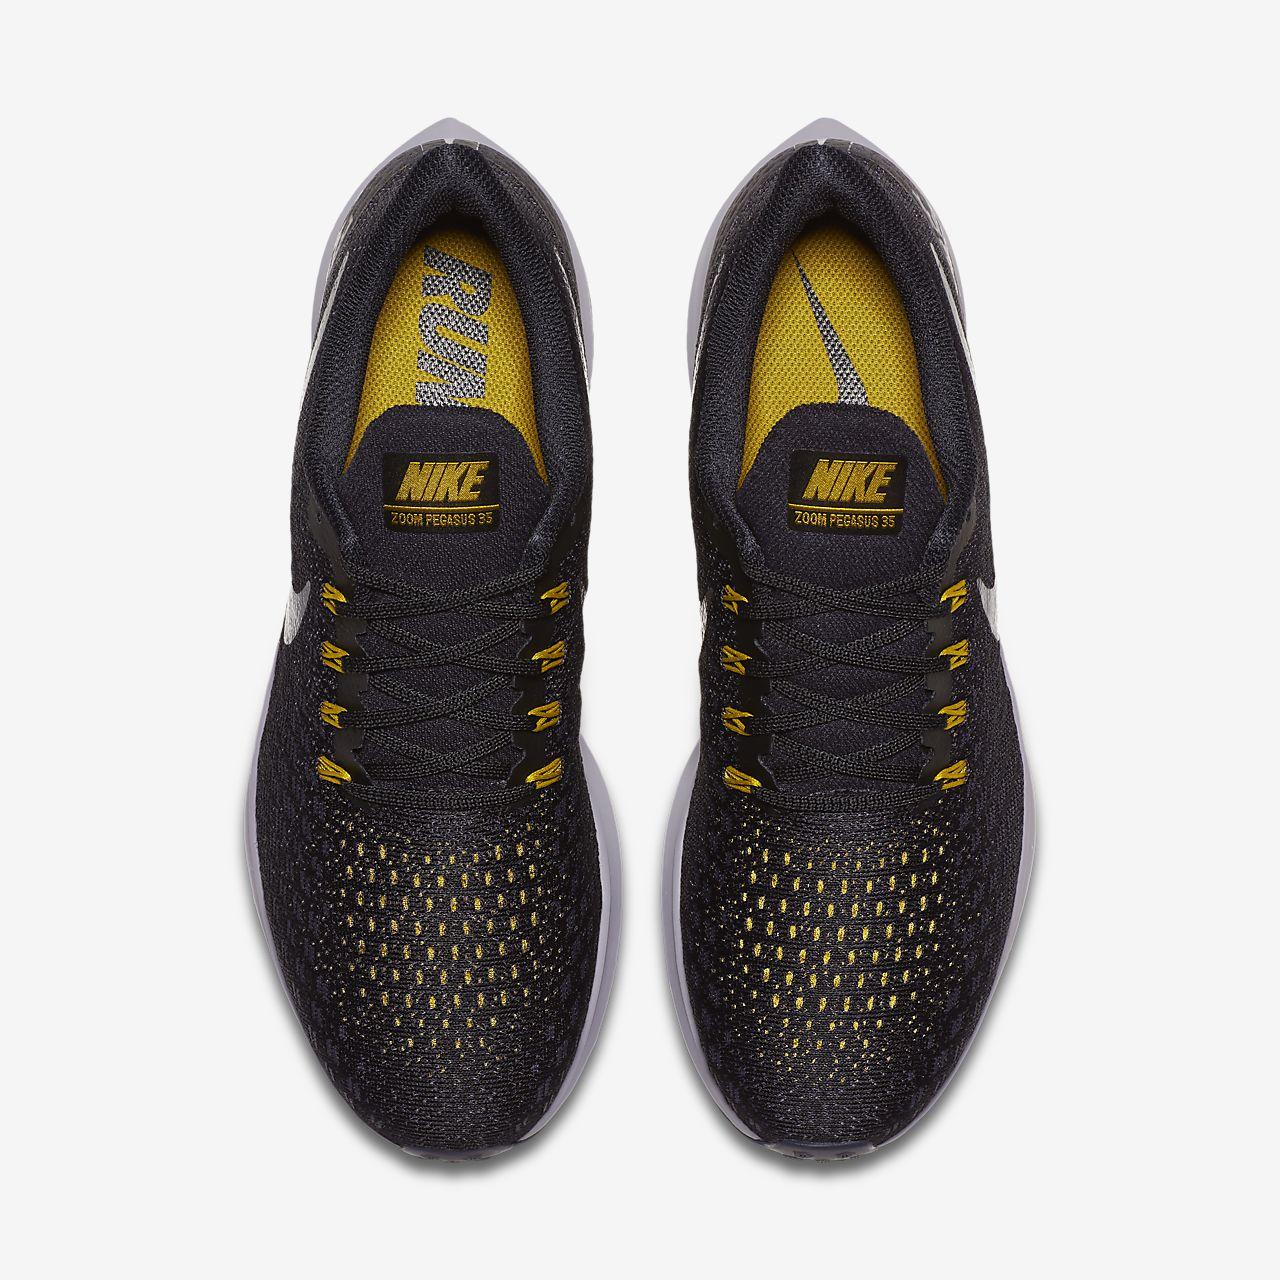 promo code 609d2 f1c99 ... Chaussure de running Nike Air Zoom Pegasus 35 pour Homme